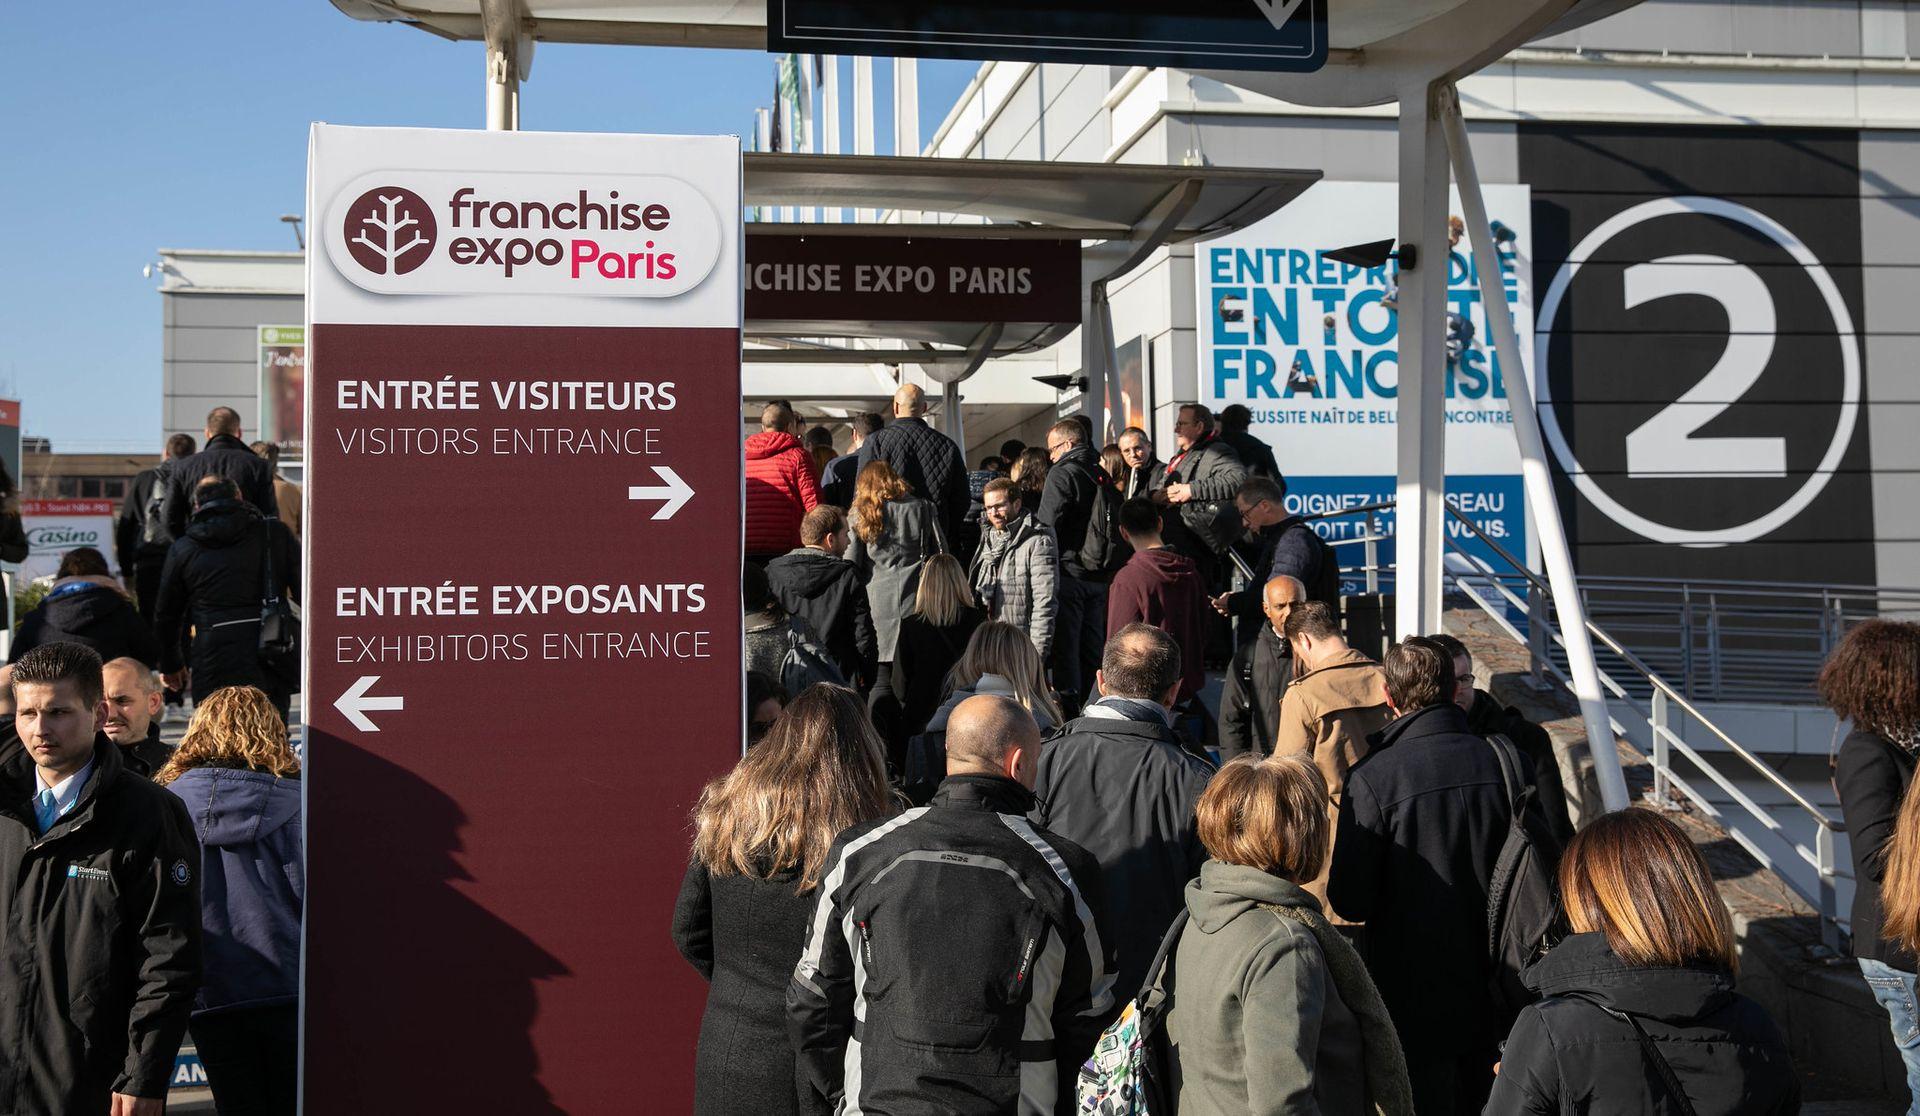 Ab Sonntag in Paris: die größte Franchise-Messe Europas